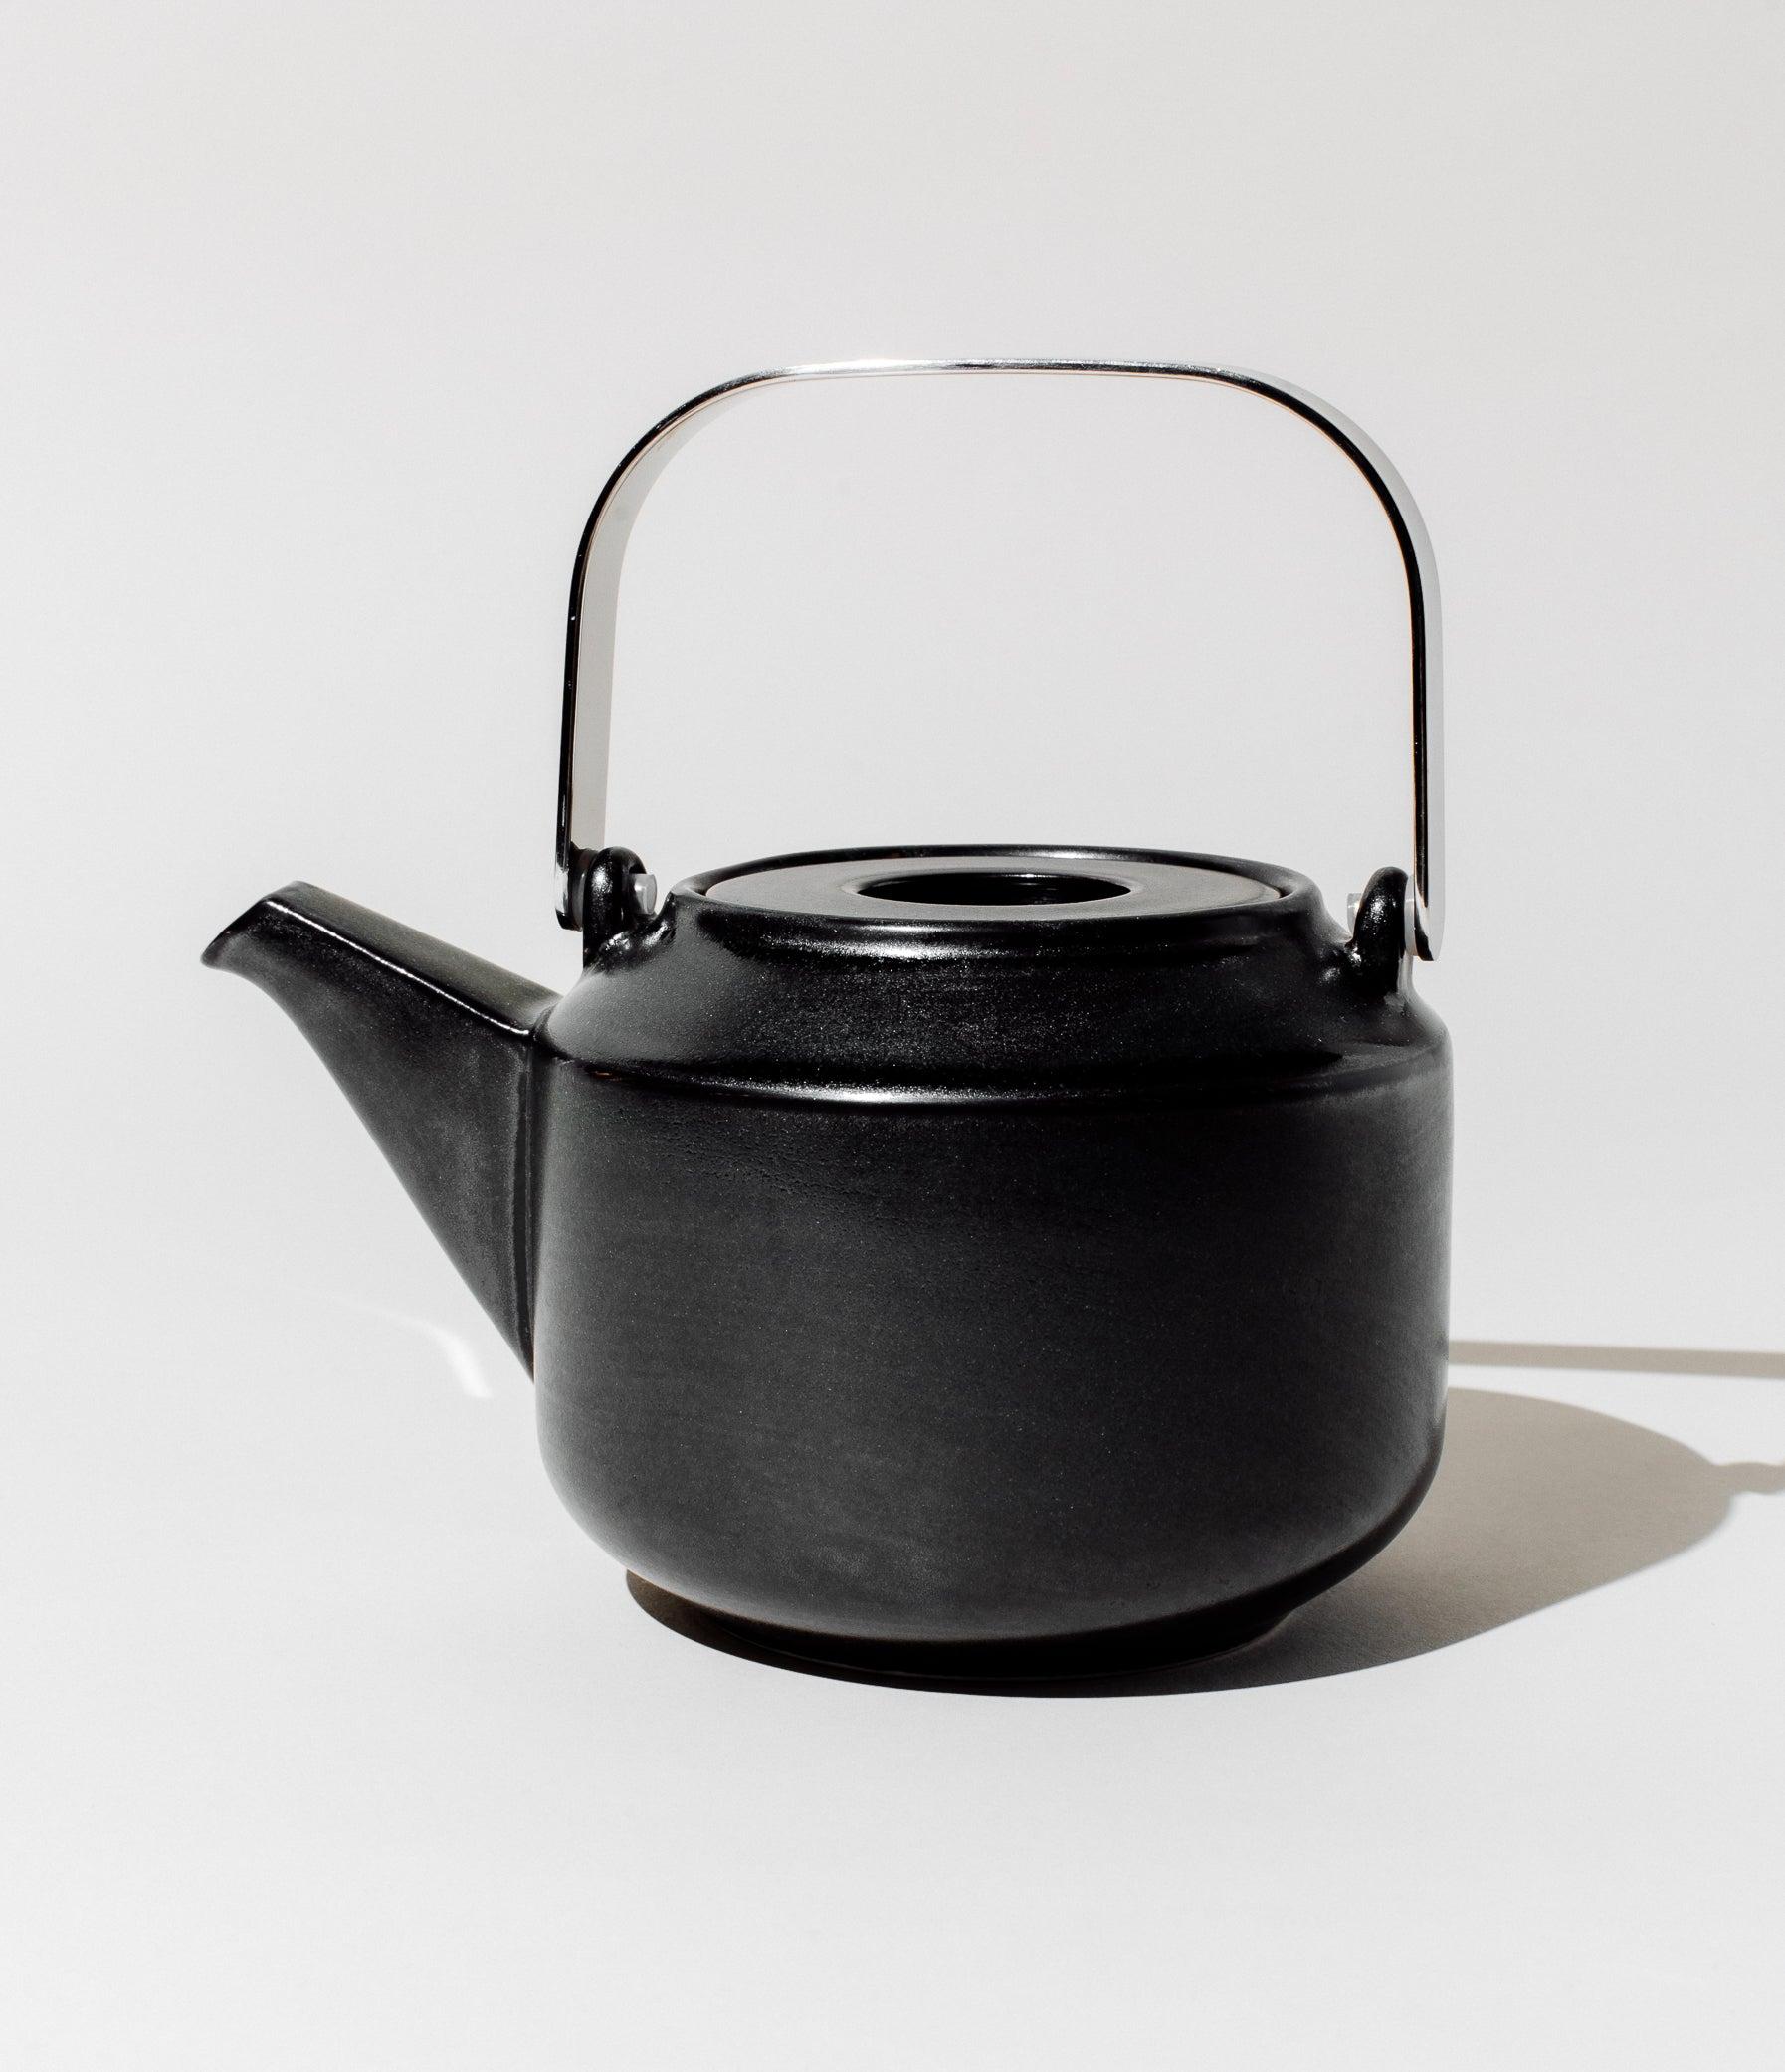 Kinto Porcelain Leaves-To-Tea Teapot Teaware BLACK by Art of Tea